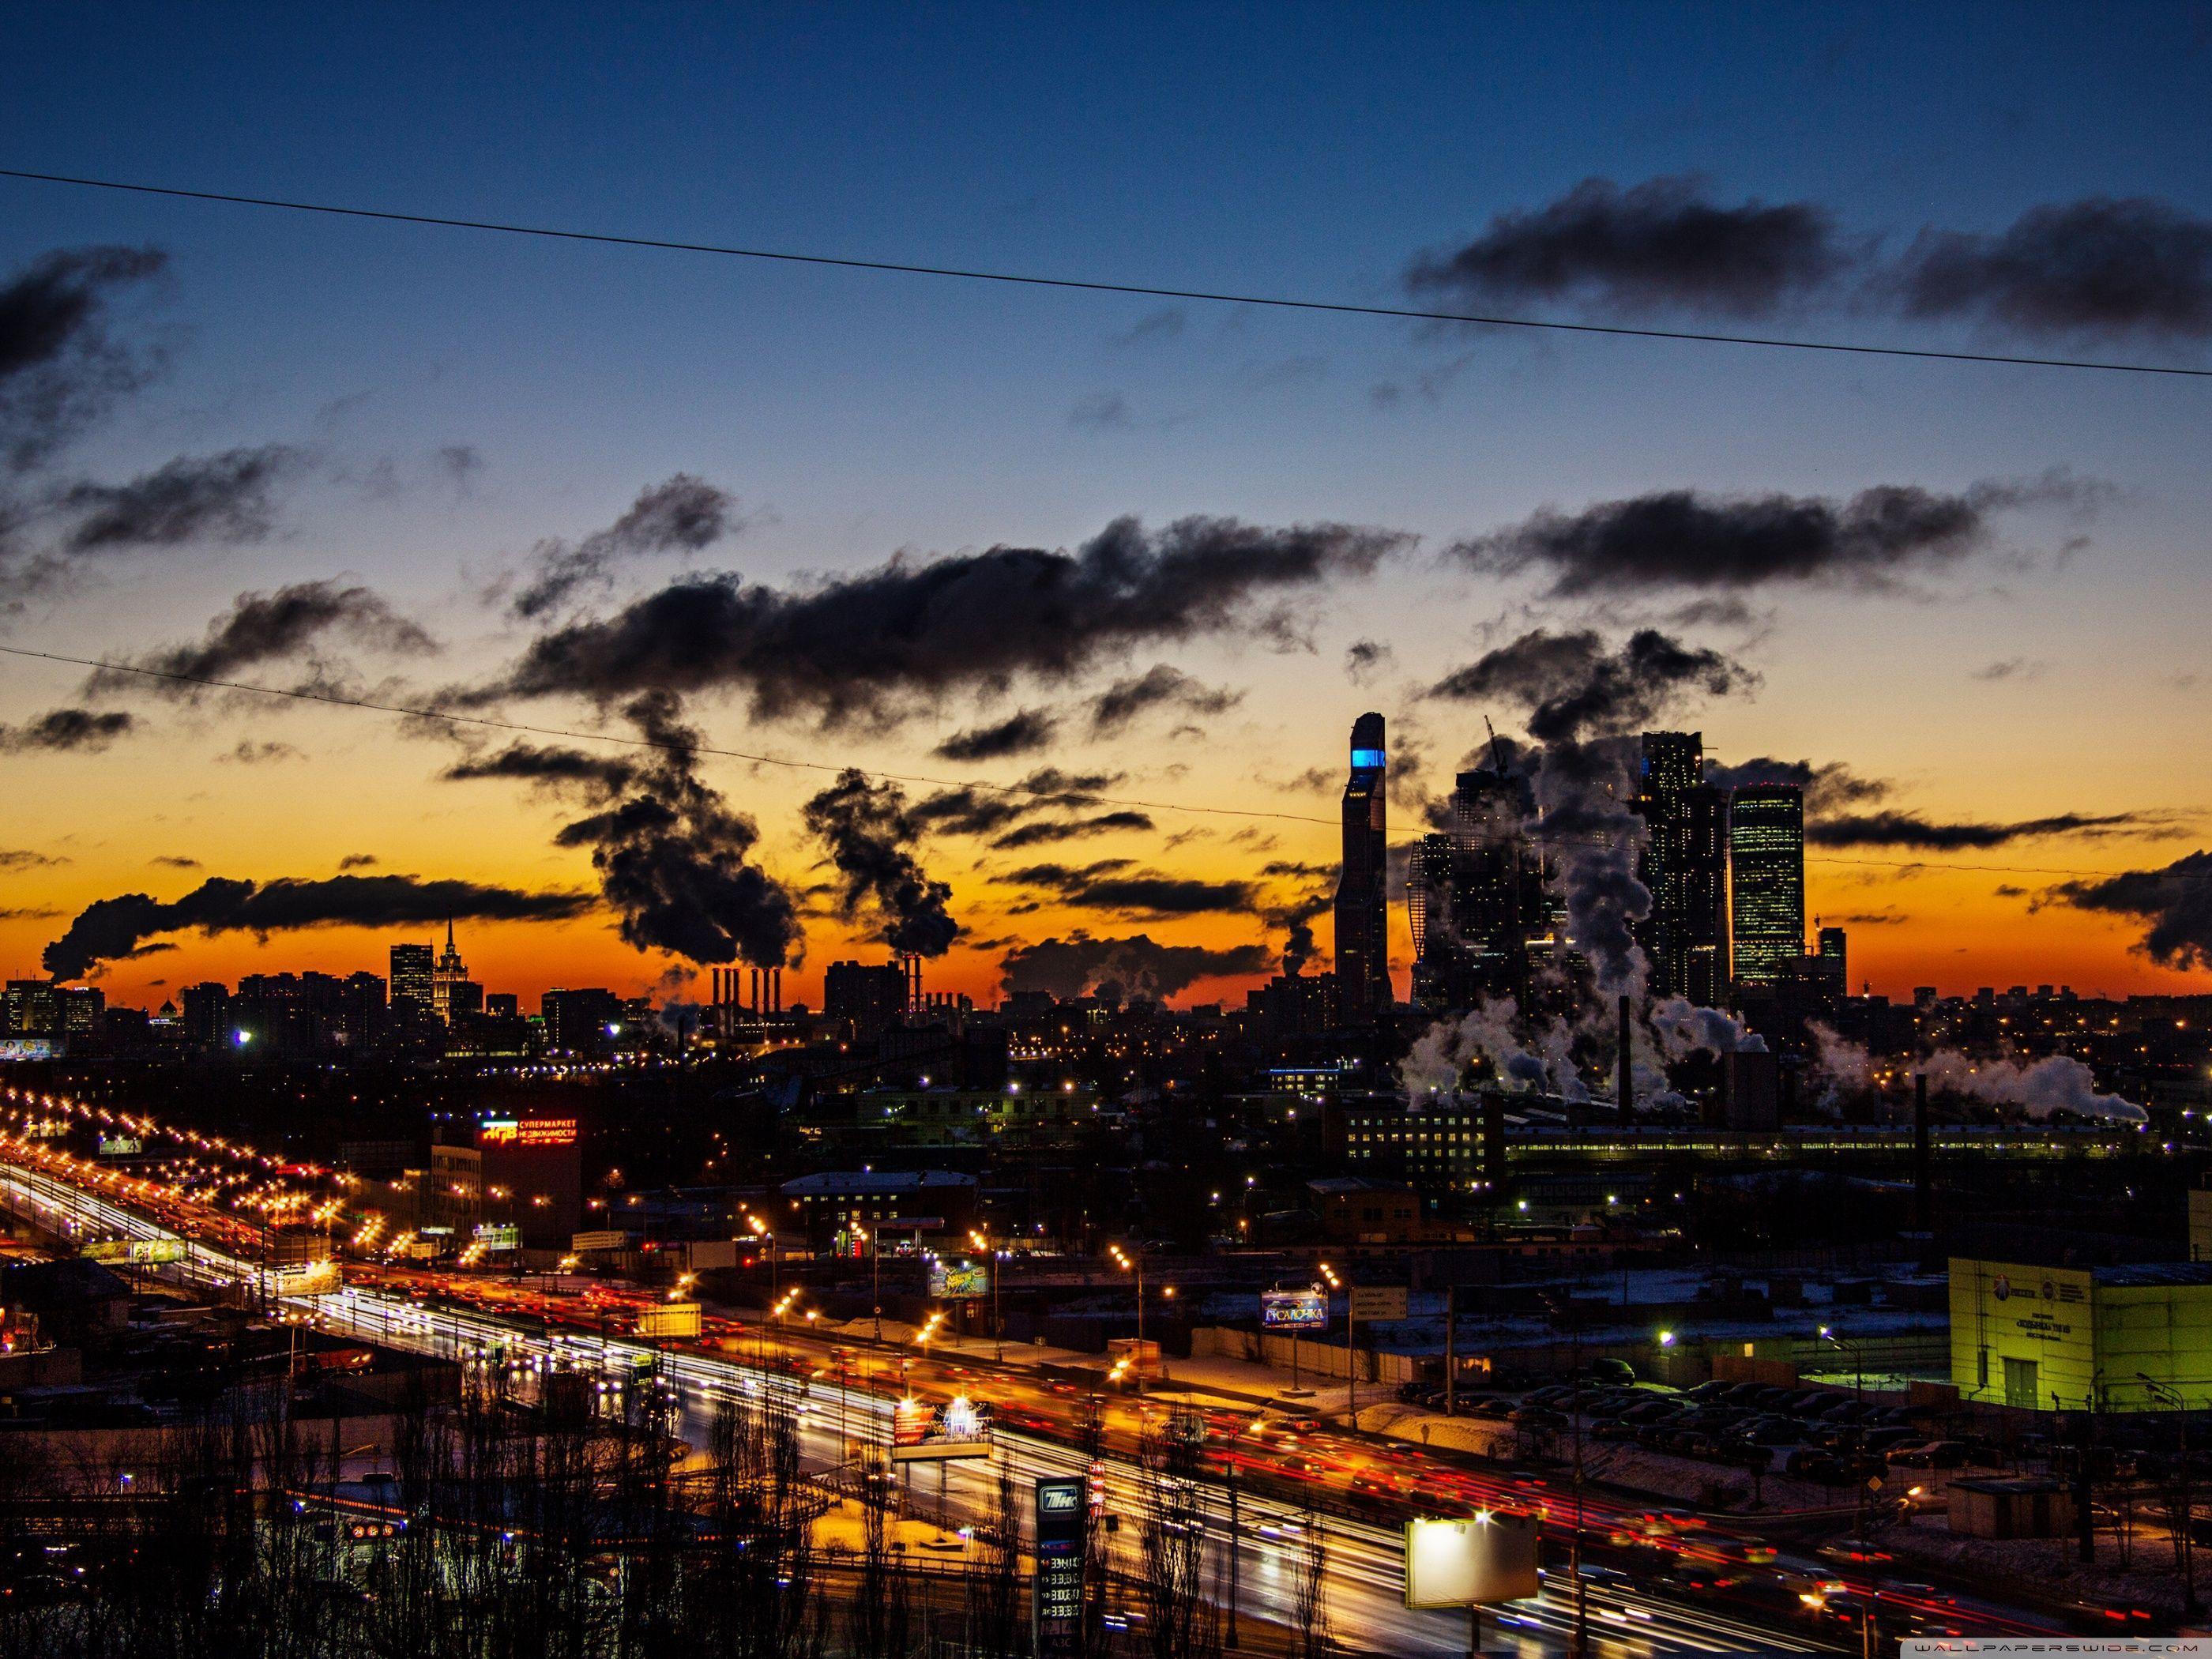 Moscow city 2014 (ART.IRBIS Production) HD desktop wallpaper ...